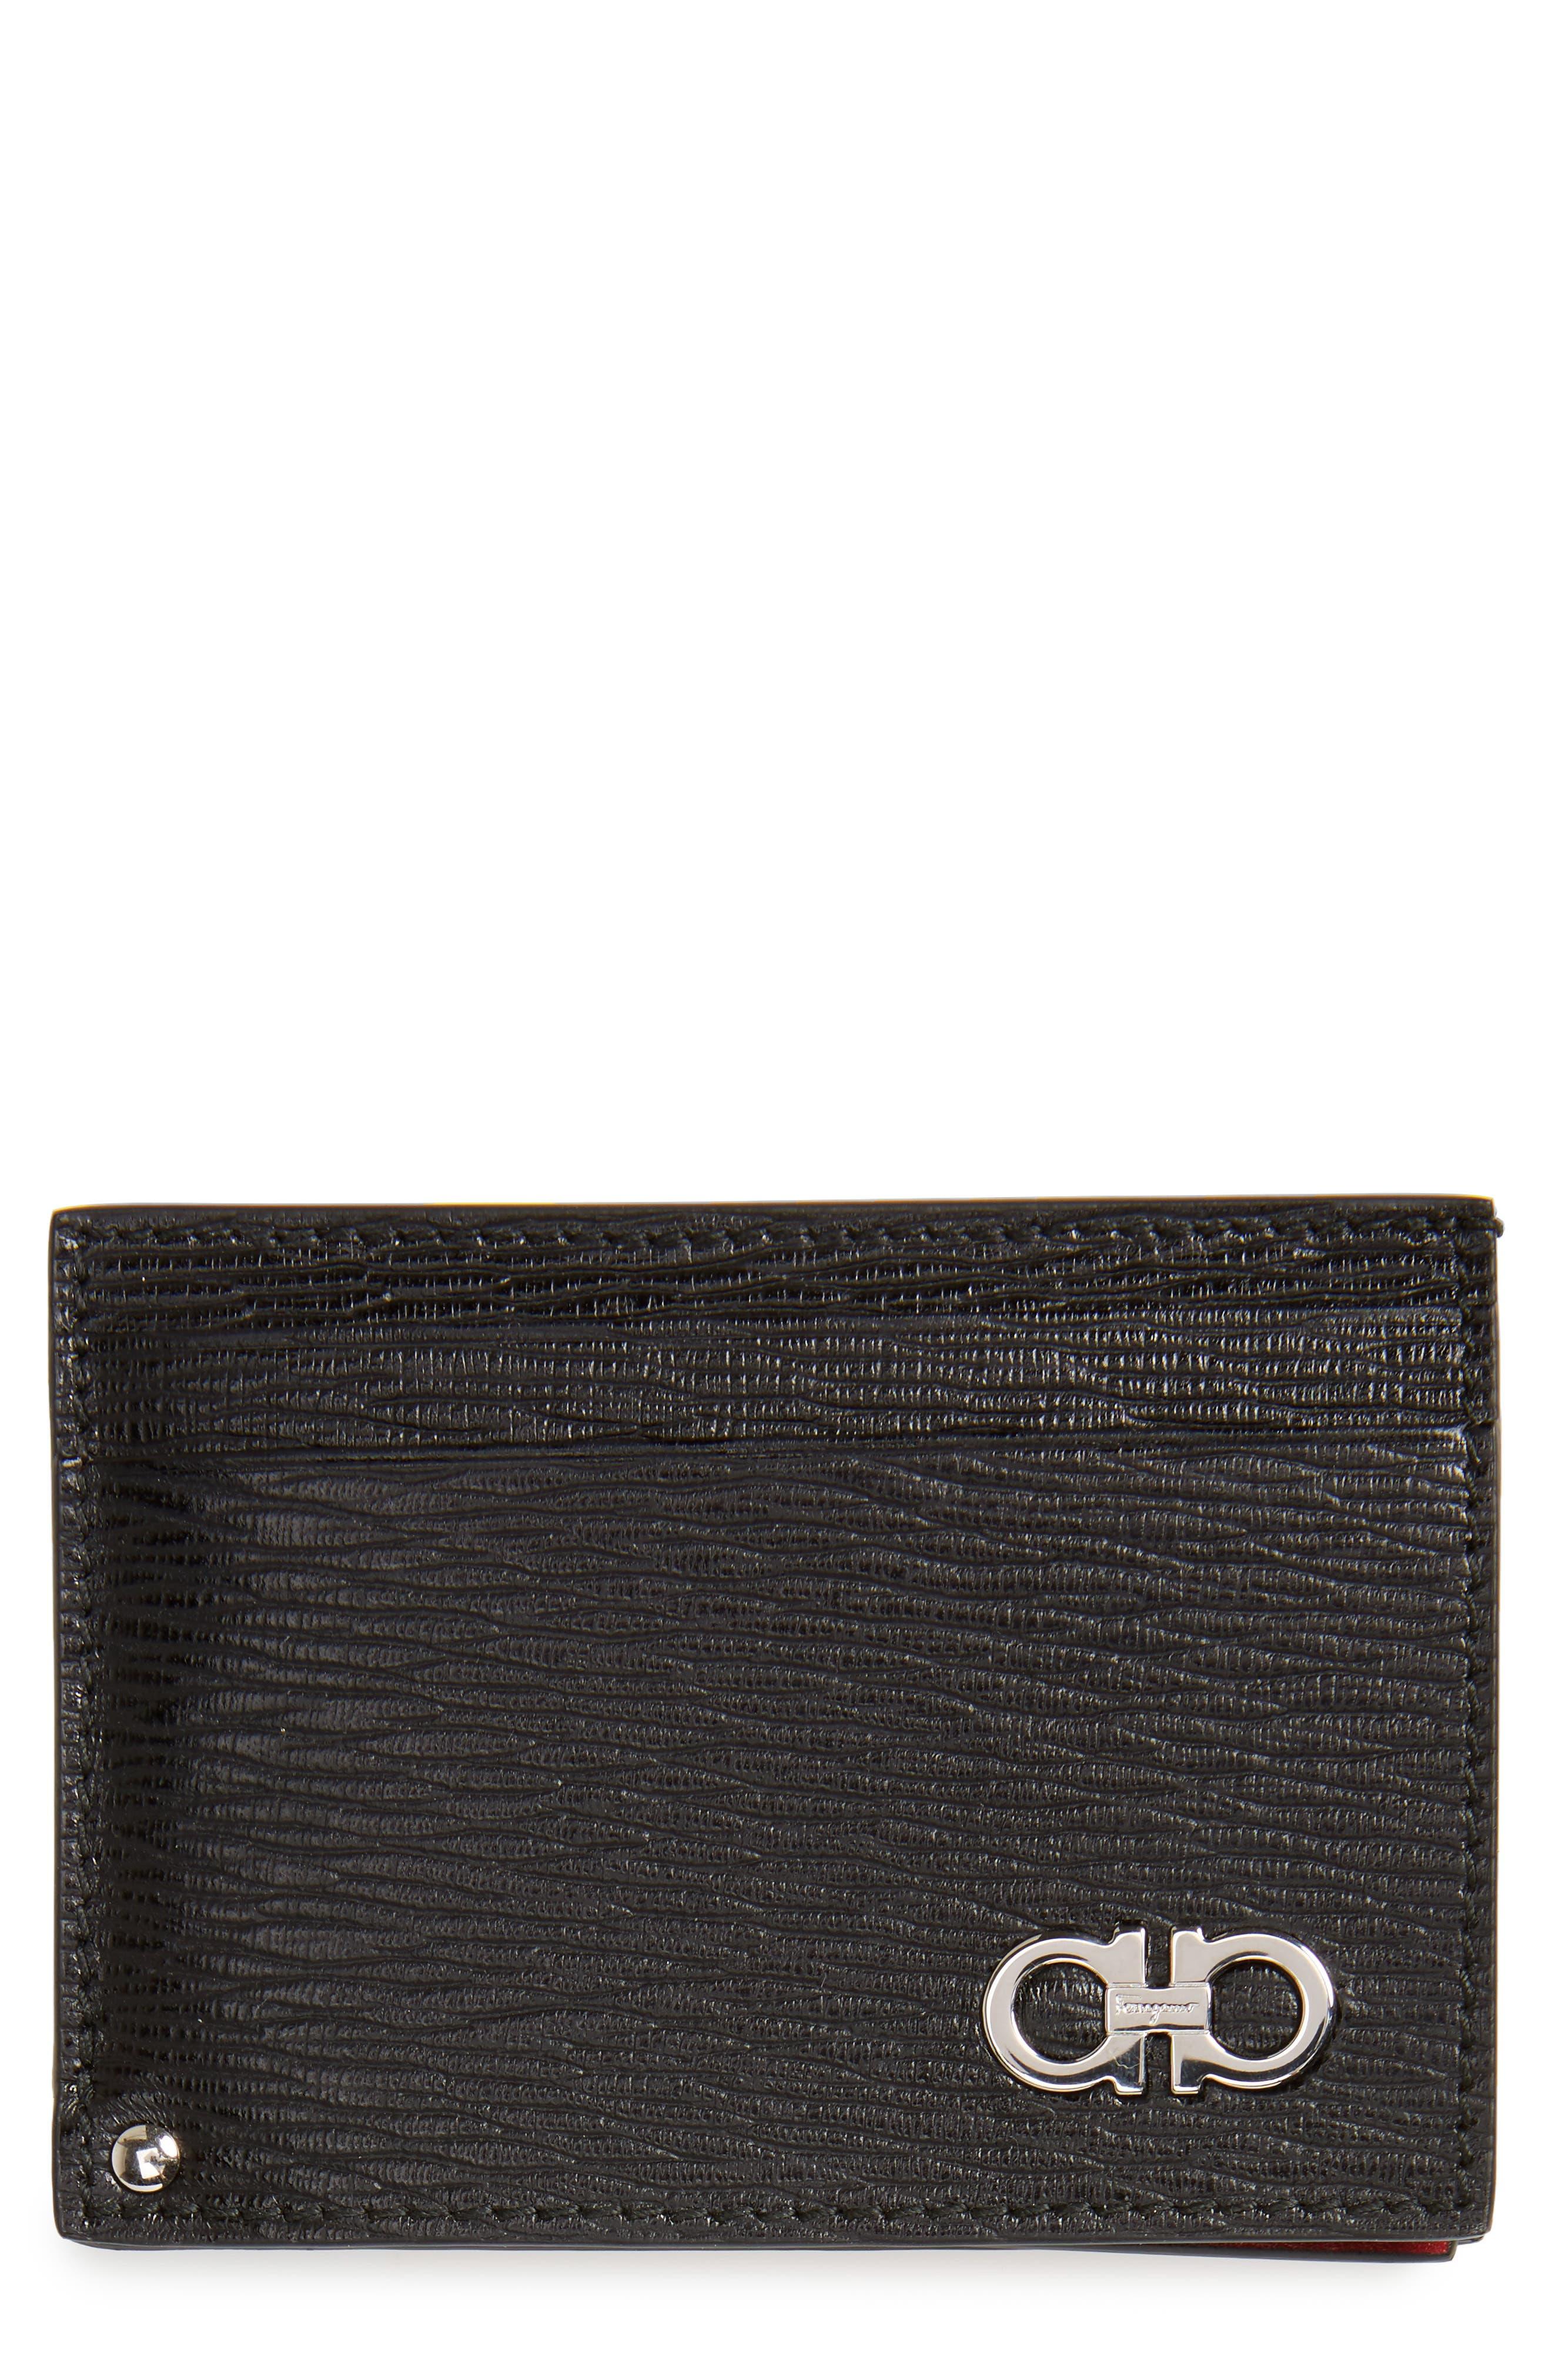 Men's Salvatore Ferragamo Revival Calfskin Leather Card Case - Black